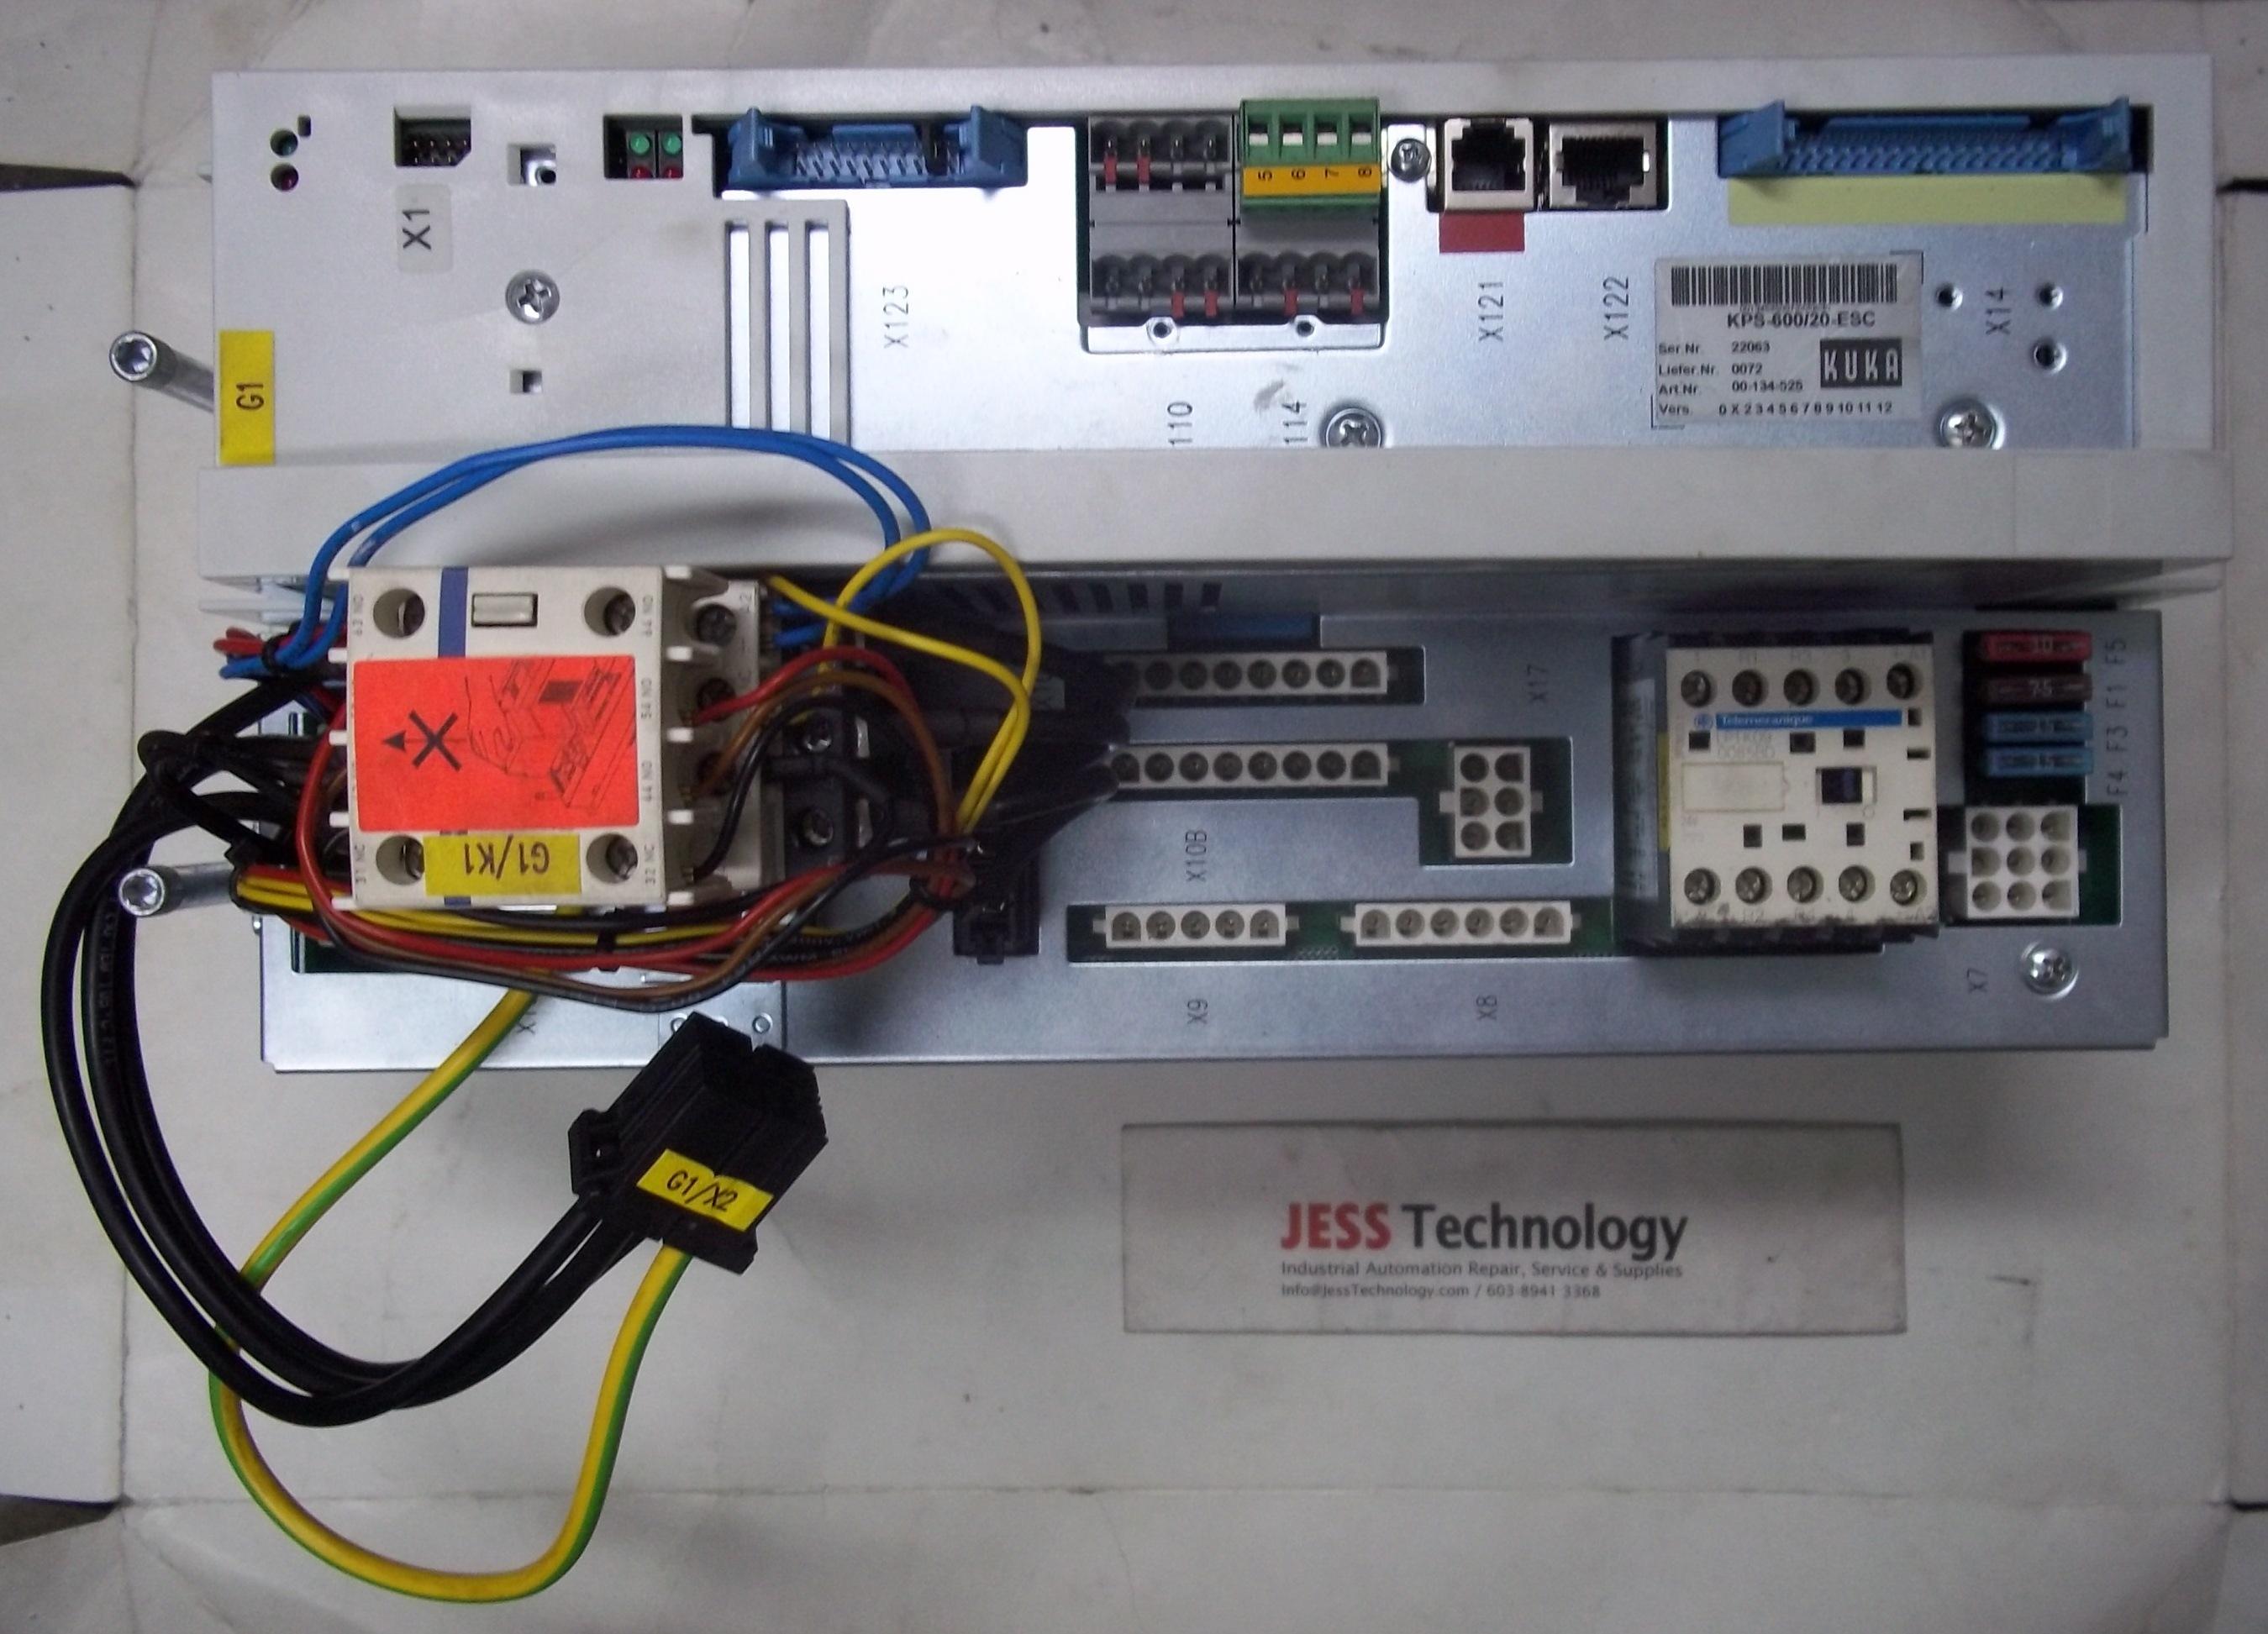 jess repair kuka power supply kps 600 20 esc in malaysia rh jesstechnology com Mixture of Electrical Supplies Electrical Parts Supplies